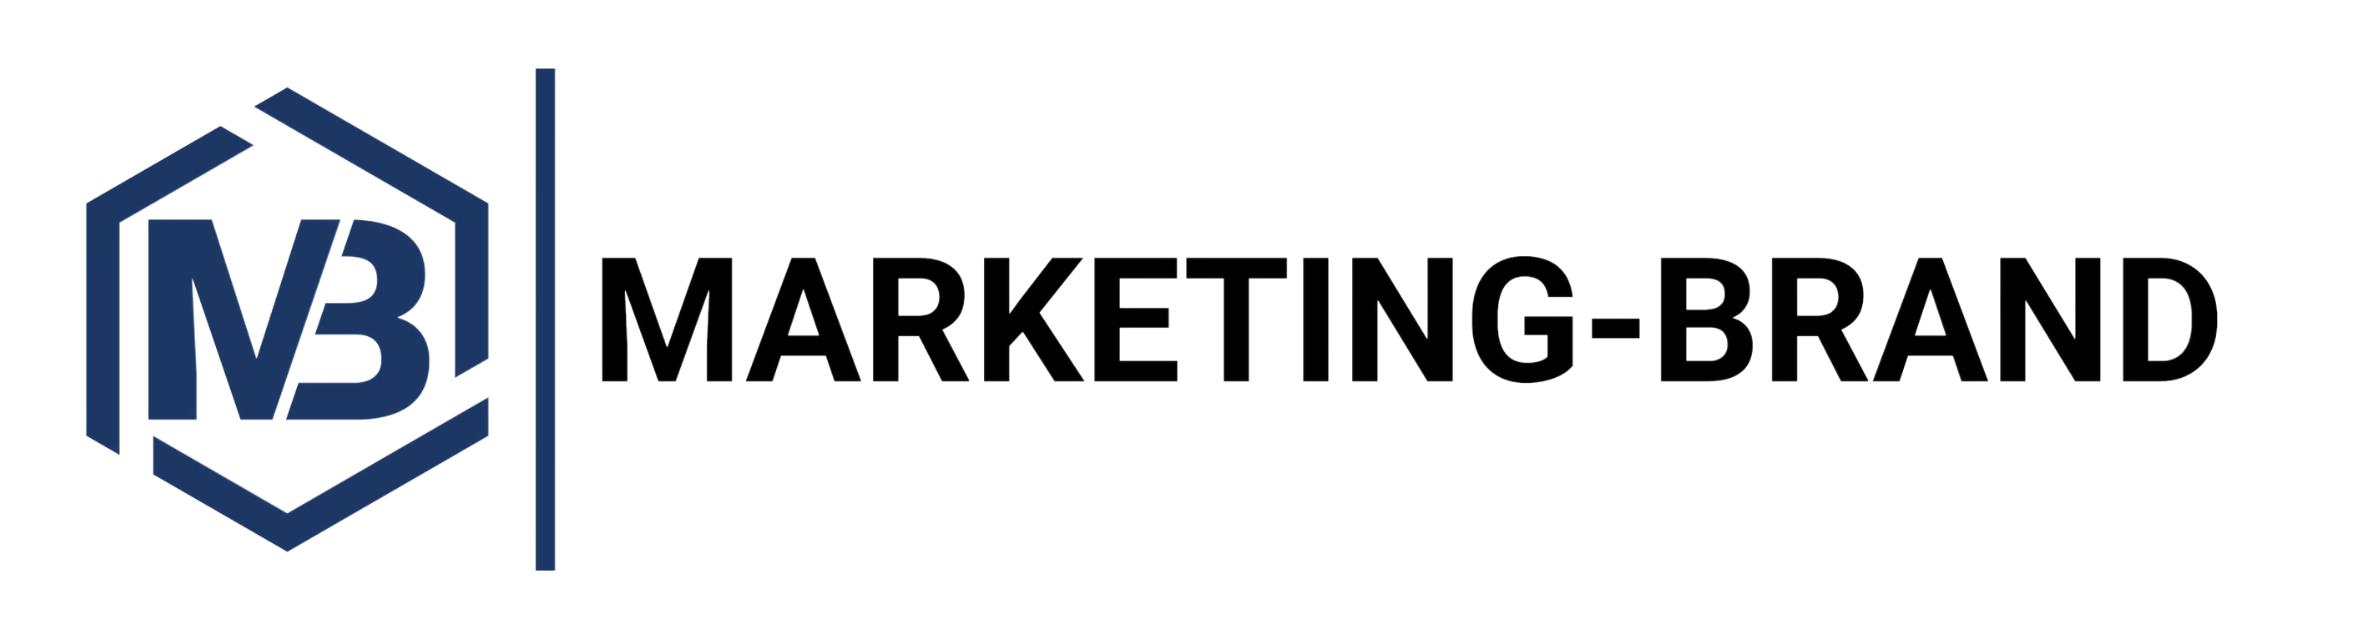 Marketing-Brand